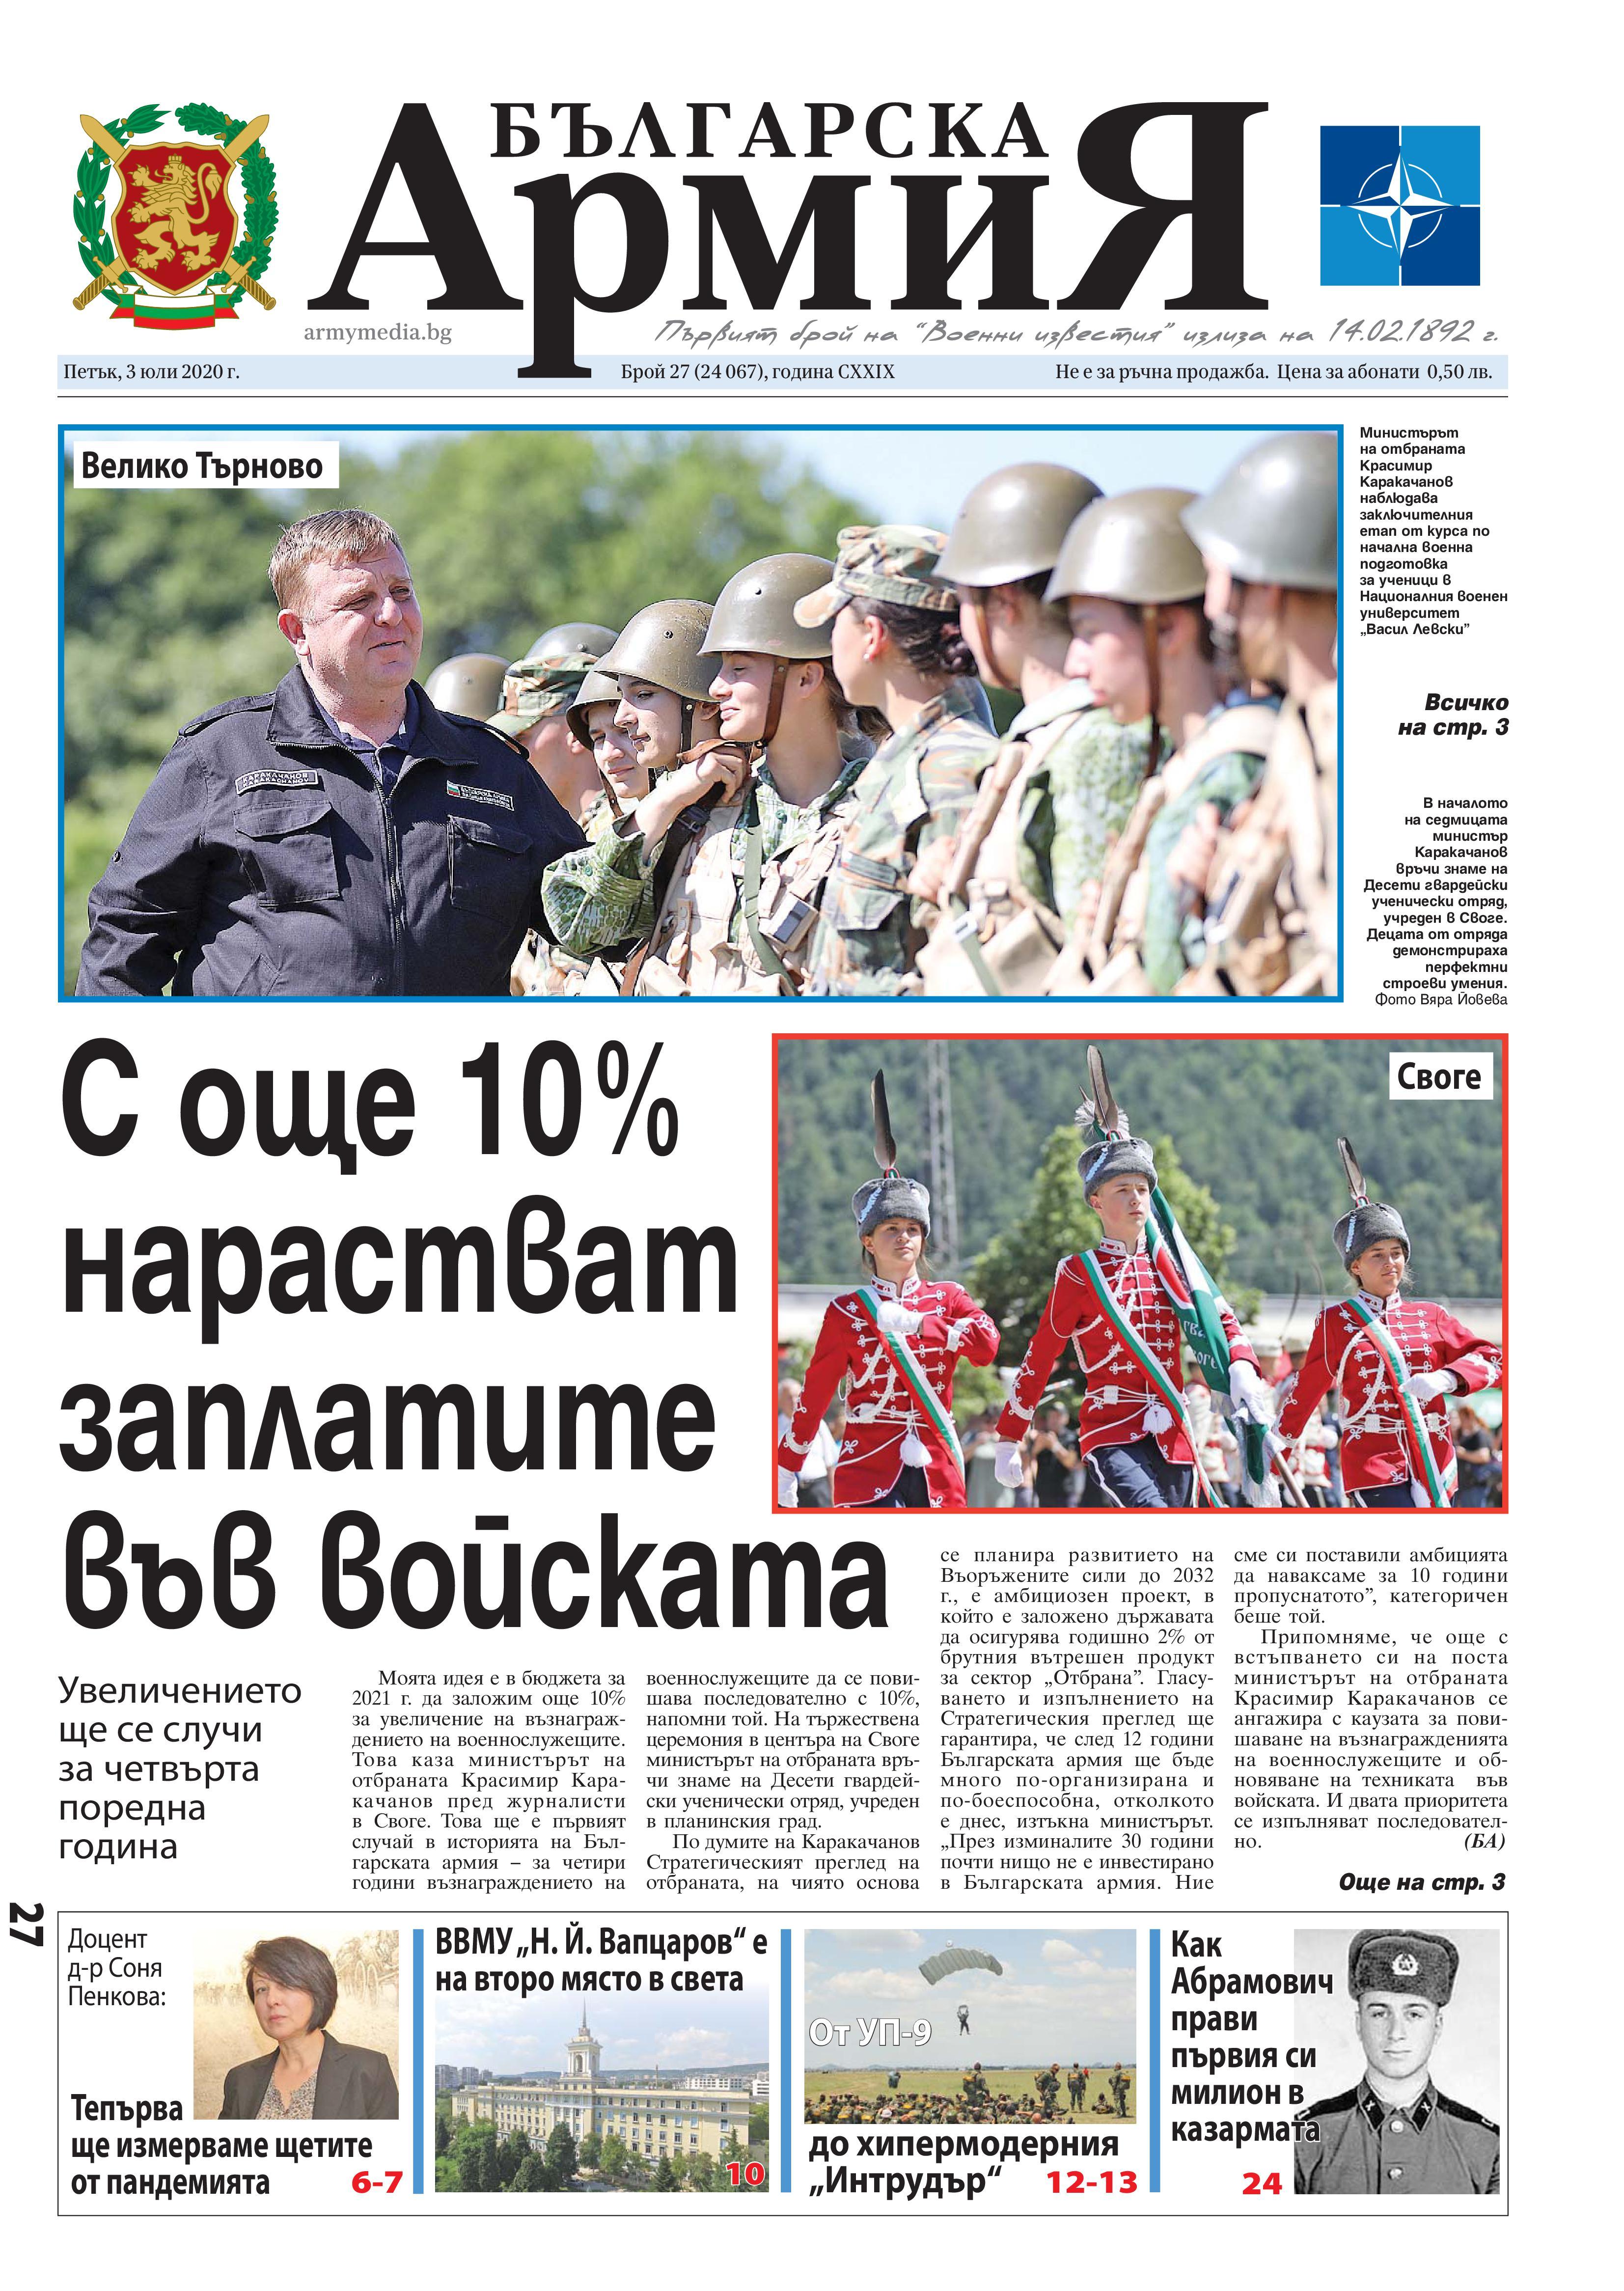 https://www.armymedia.bg/wp-content/uploads/2015/06/01-35.jpg